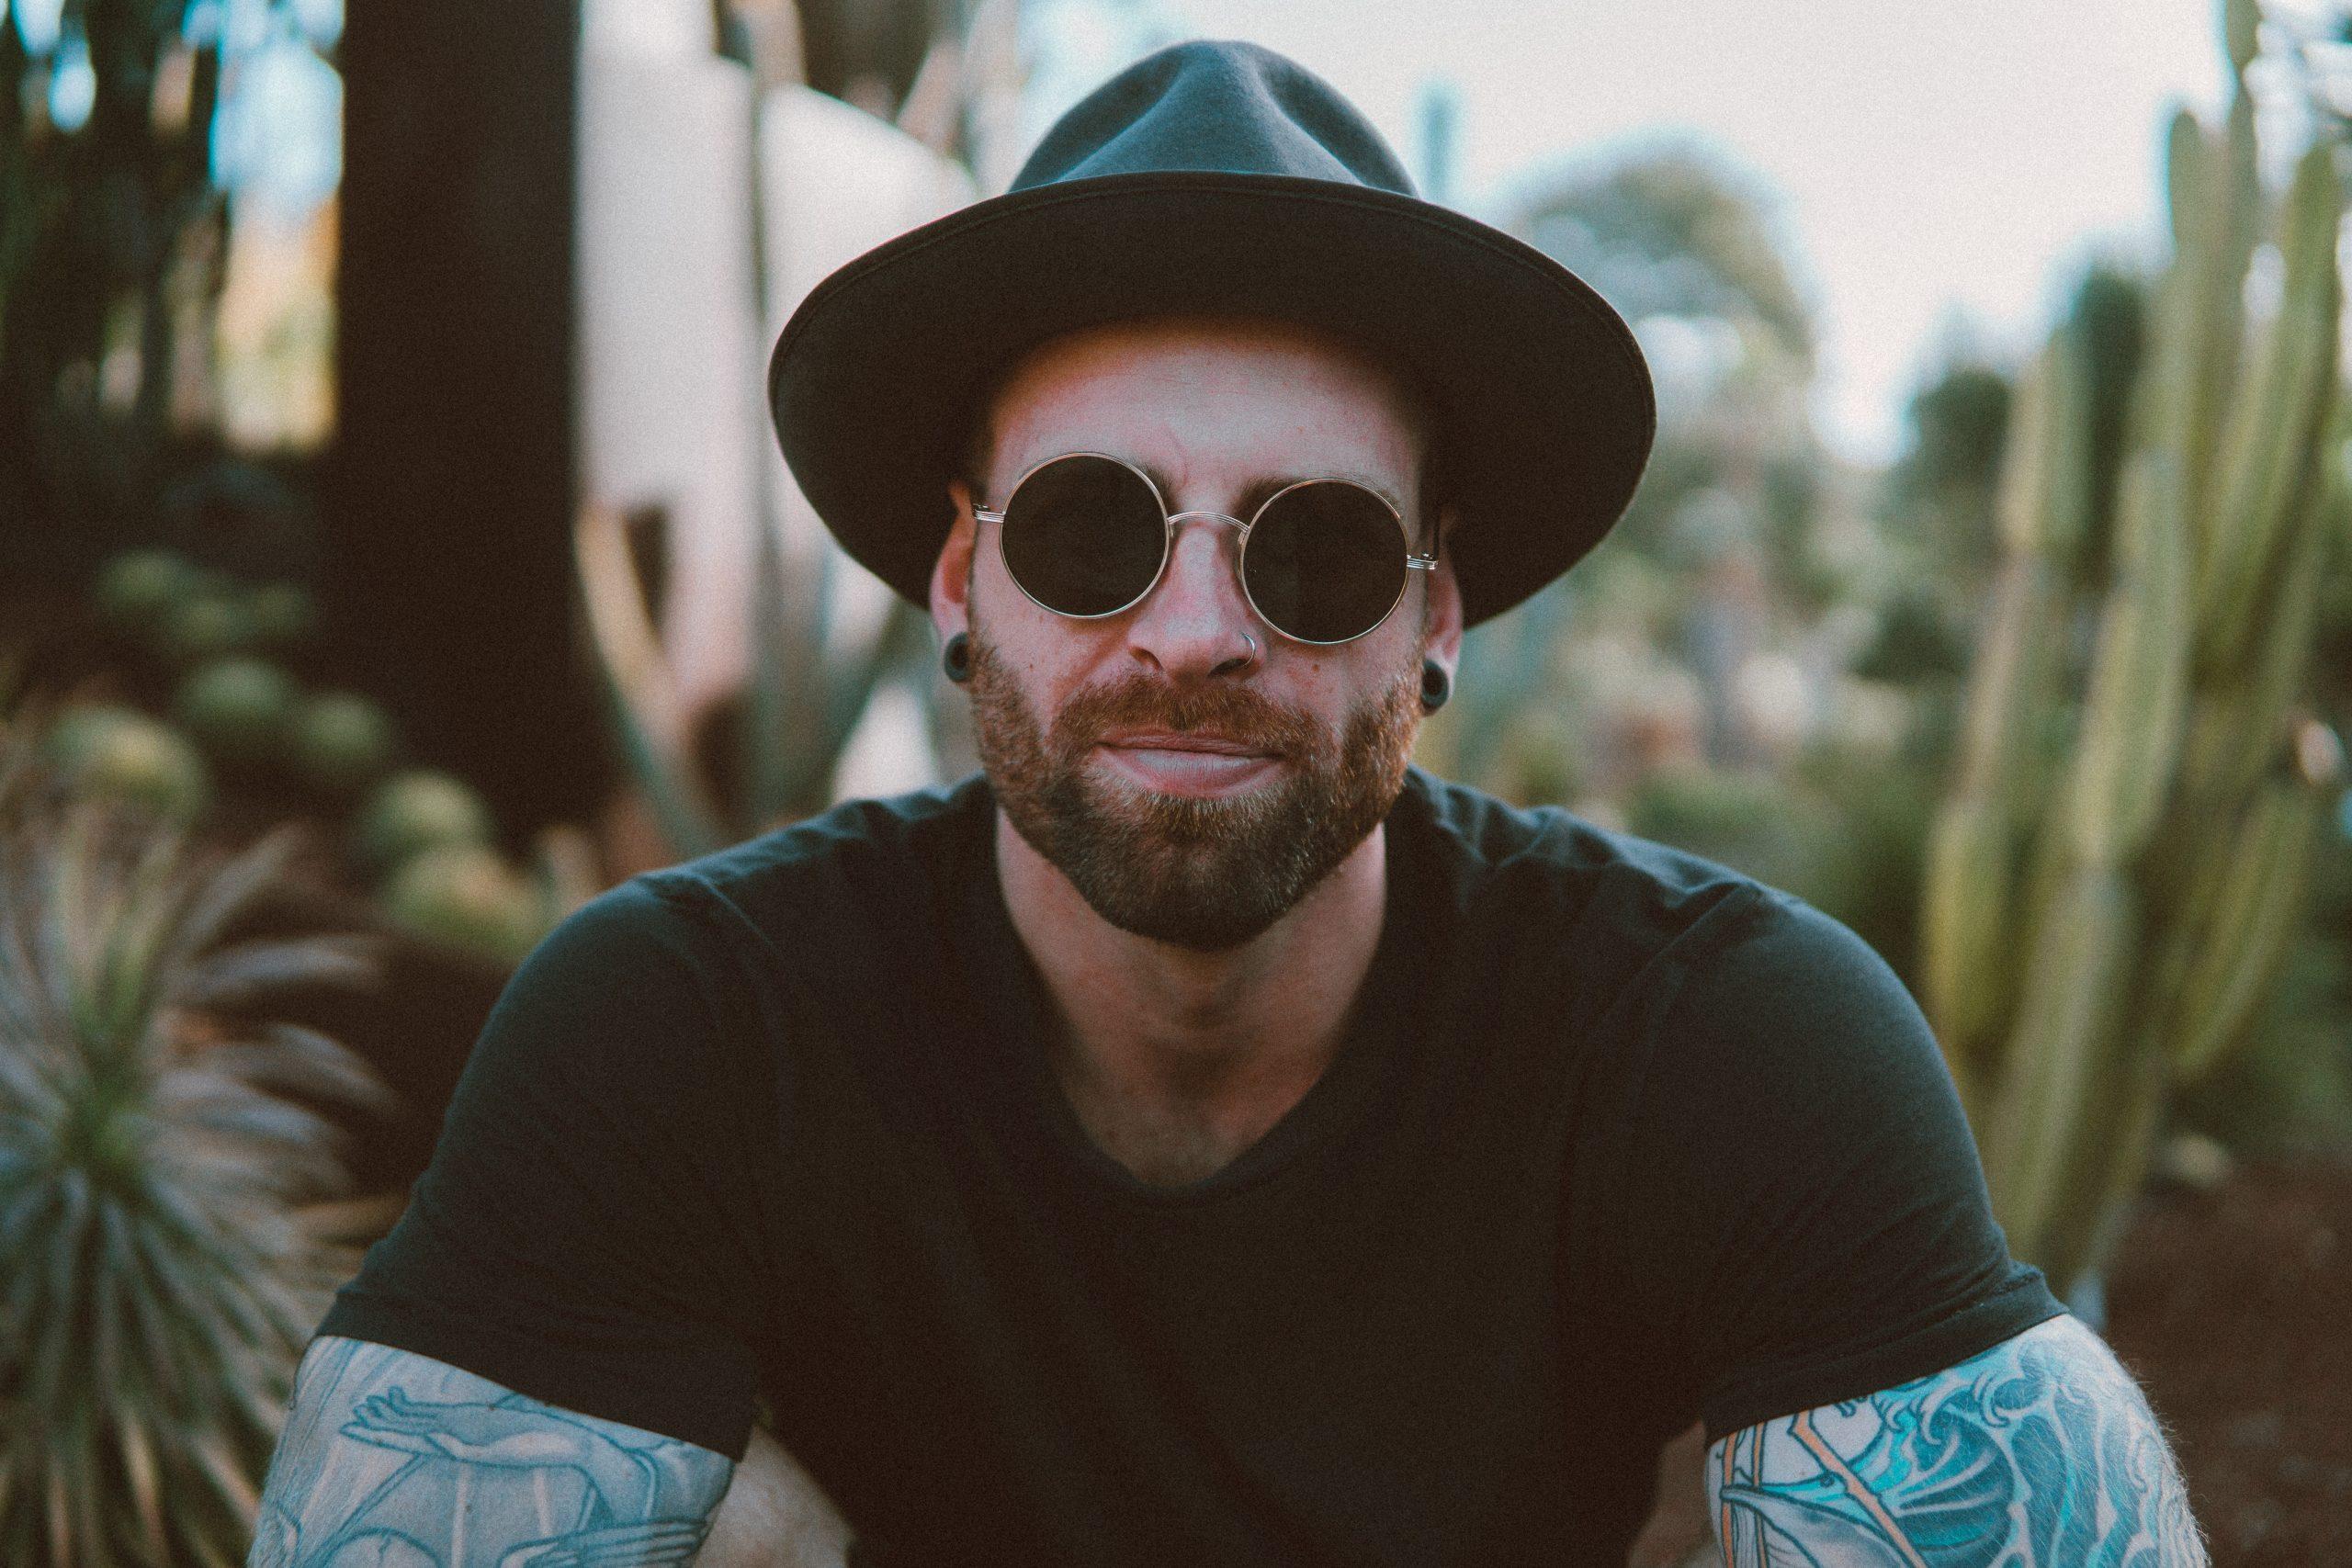 Photo of a man wearing sunglasses